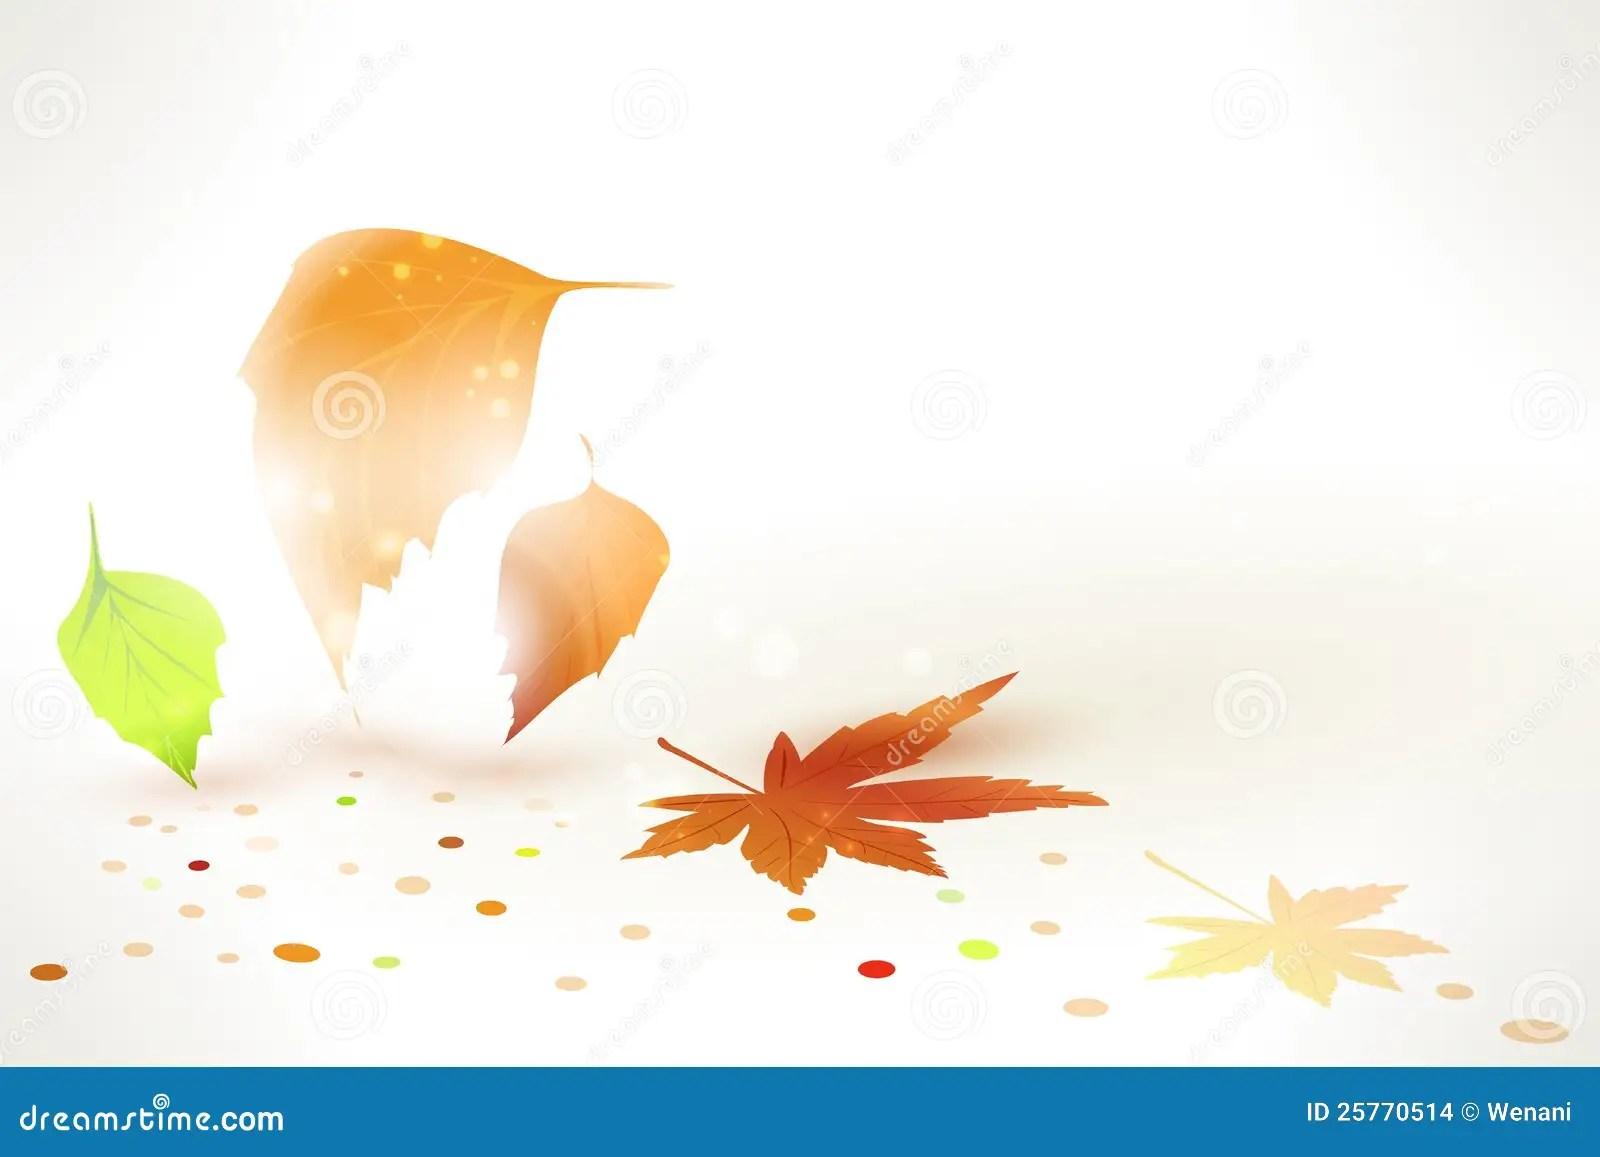 Lauren Conrad Fall Wallpaper Abstract Autumn Leaves Vector Background Stock Vector